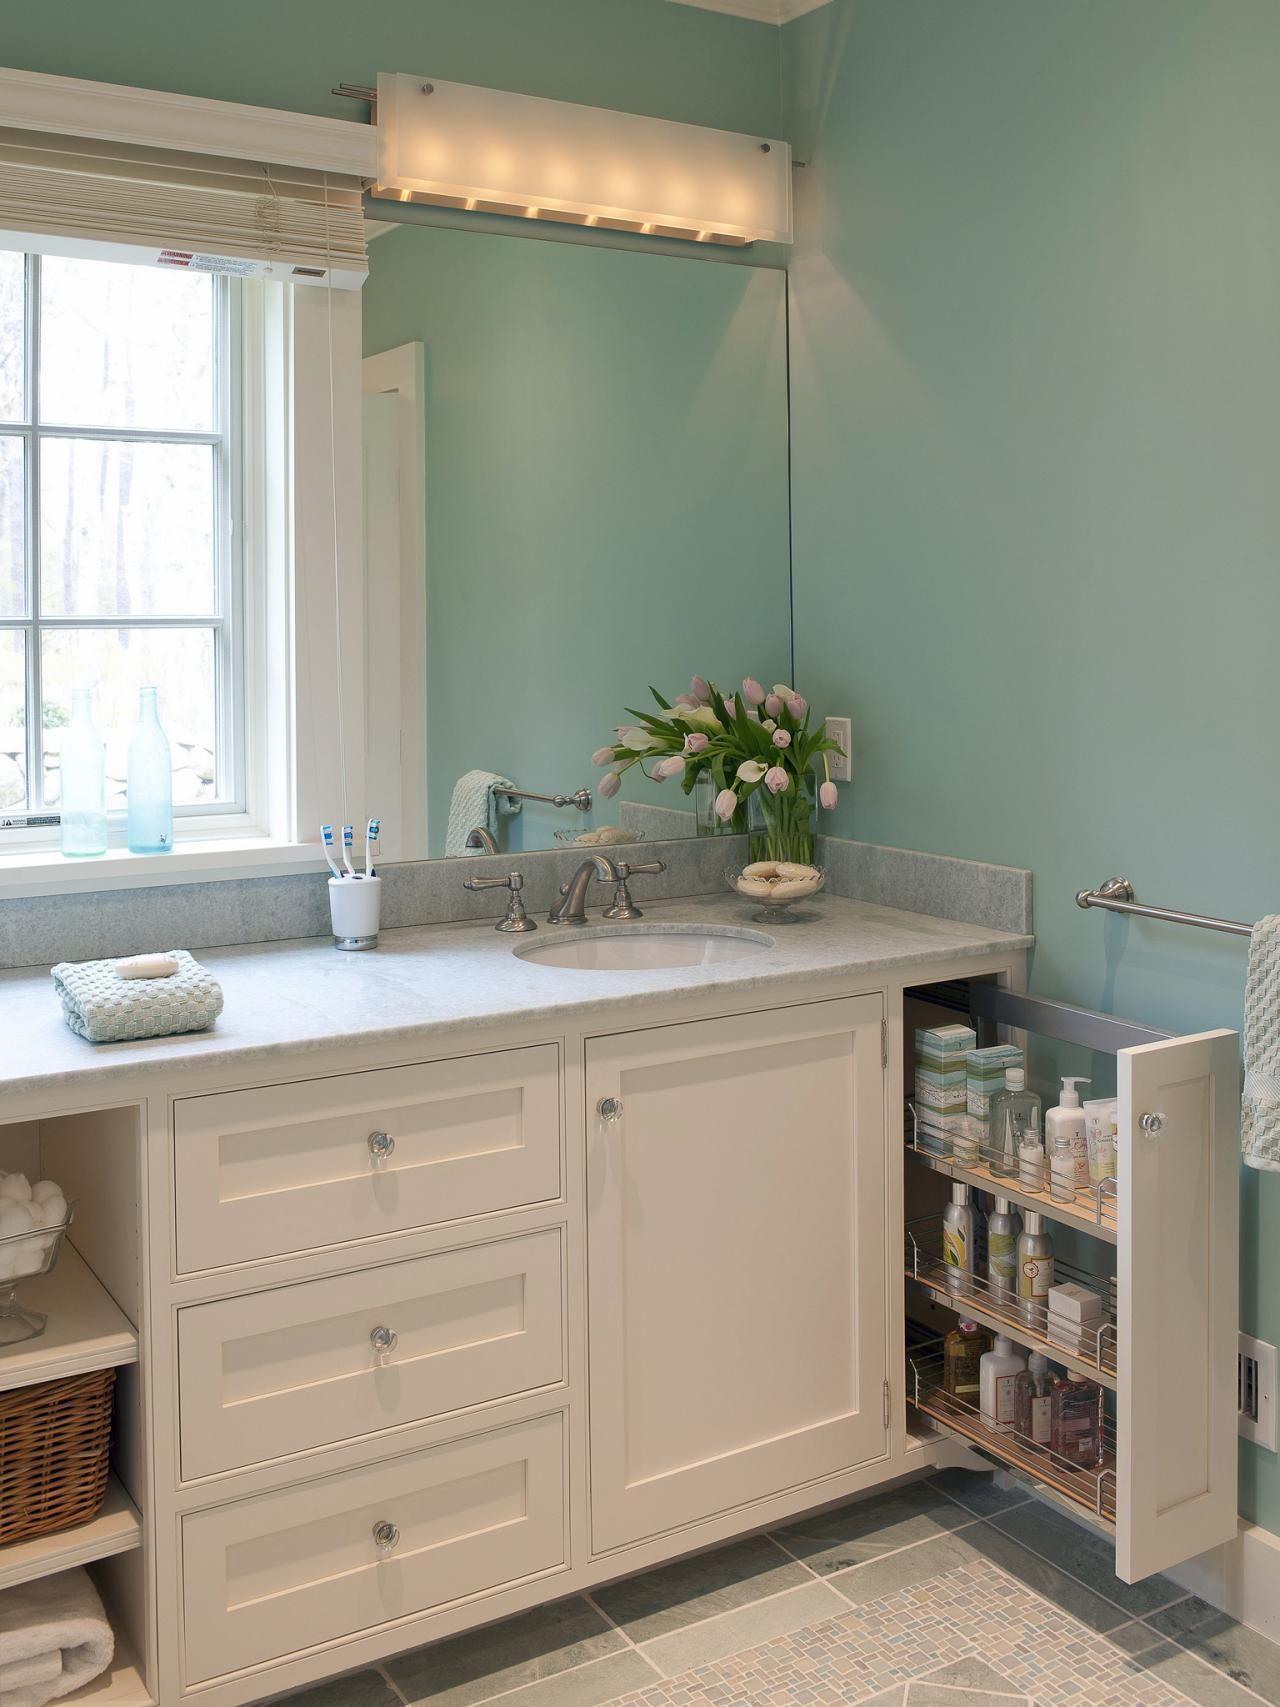 Savvy Bathroom Vanity Storage Ideas Bathroom Vanity Storage - Bathroom storage cabinet with drawers for bathroom decor ideas